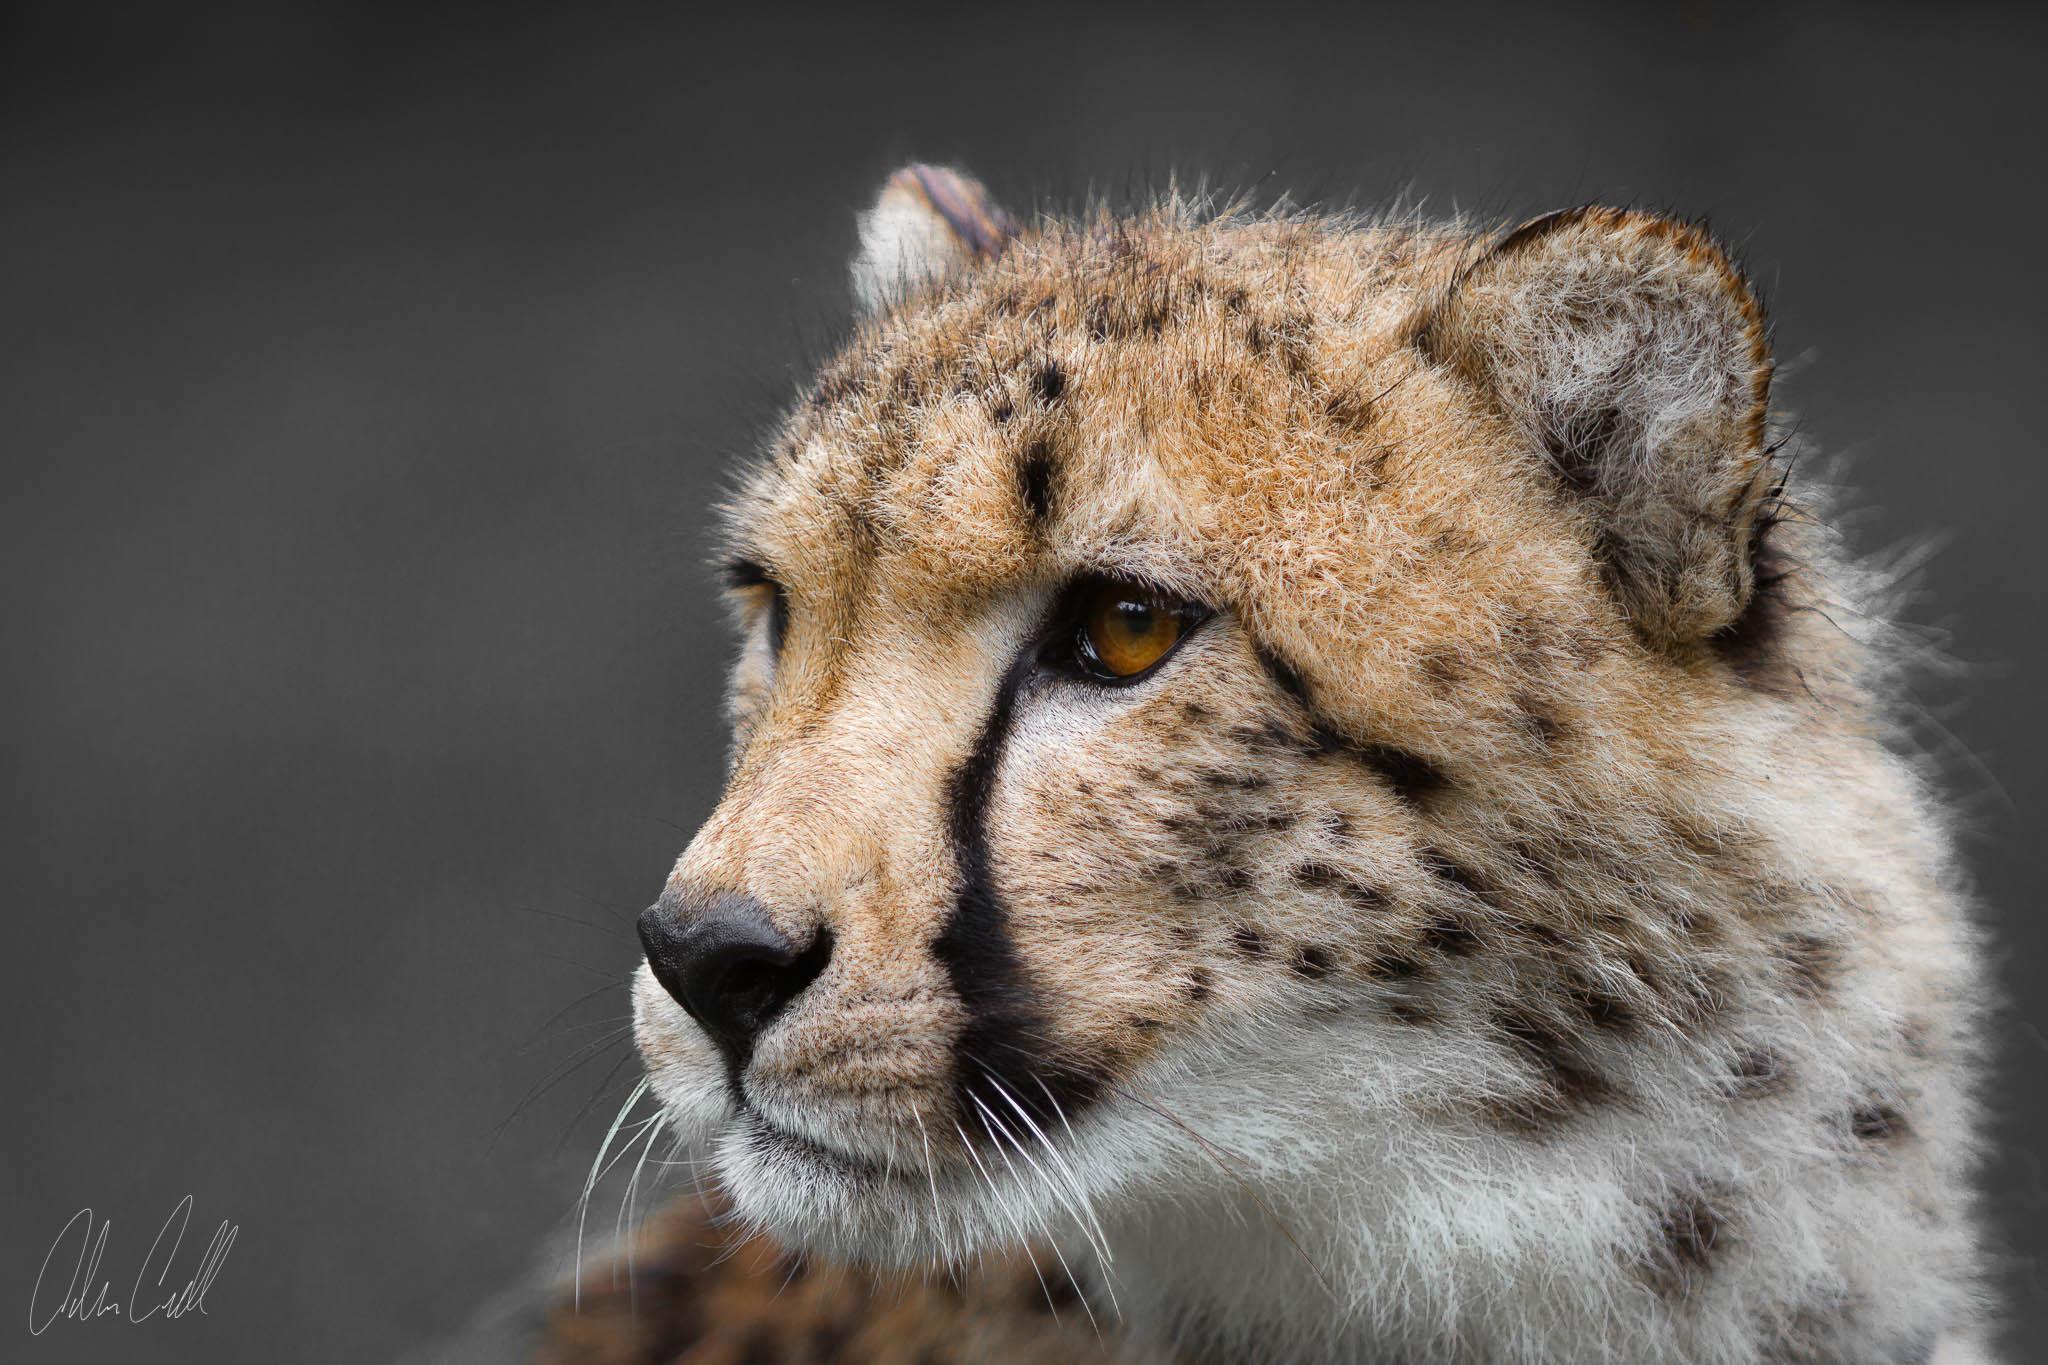 Cheetah #20130527_0059-3